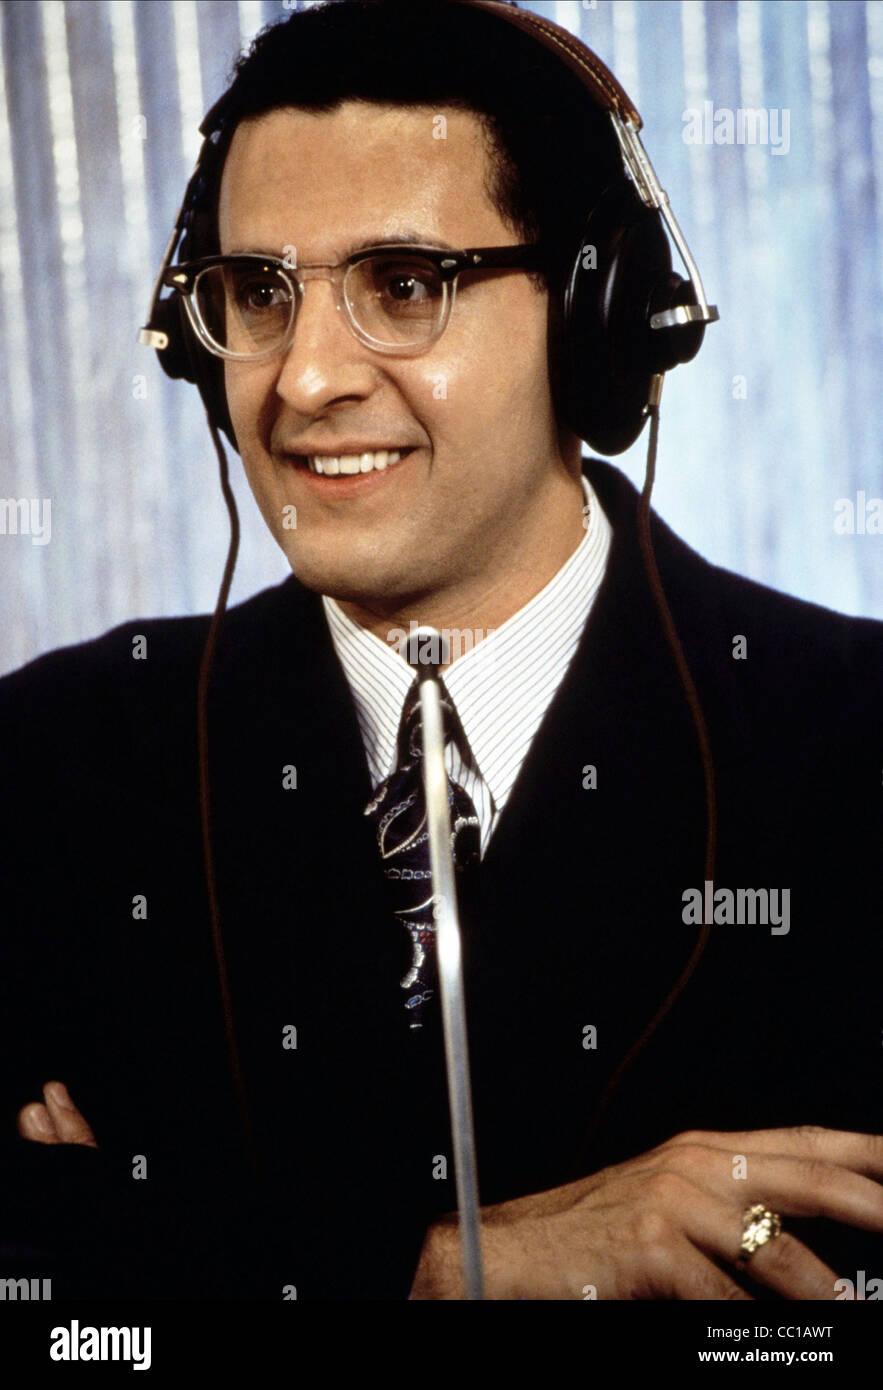 JOHN TURTURRO QUIZ SHOW (1994 Stock Photo - Alamy